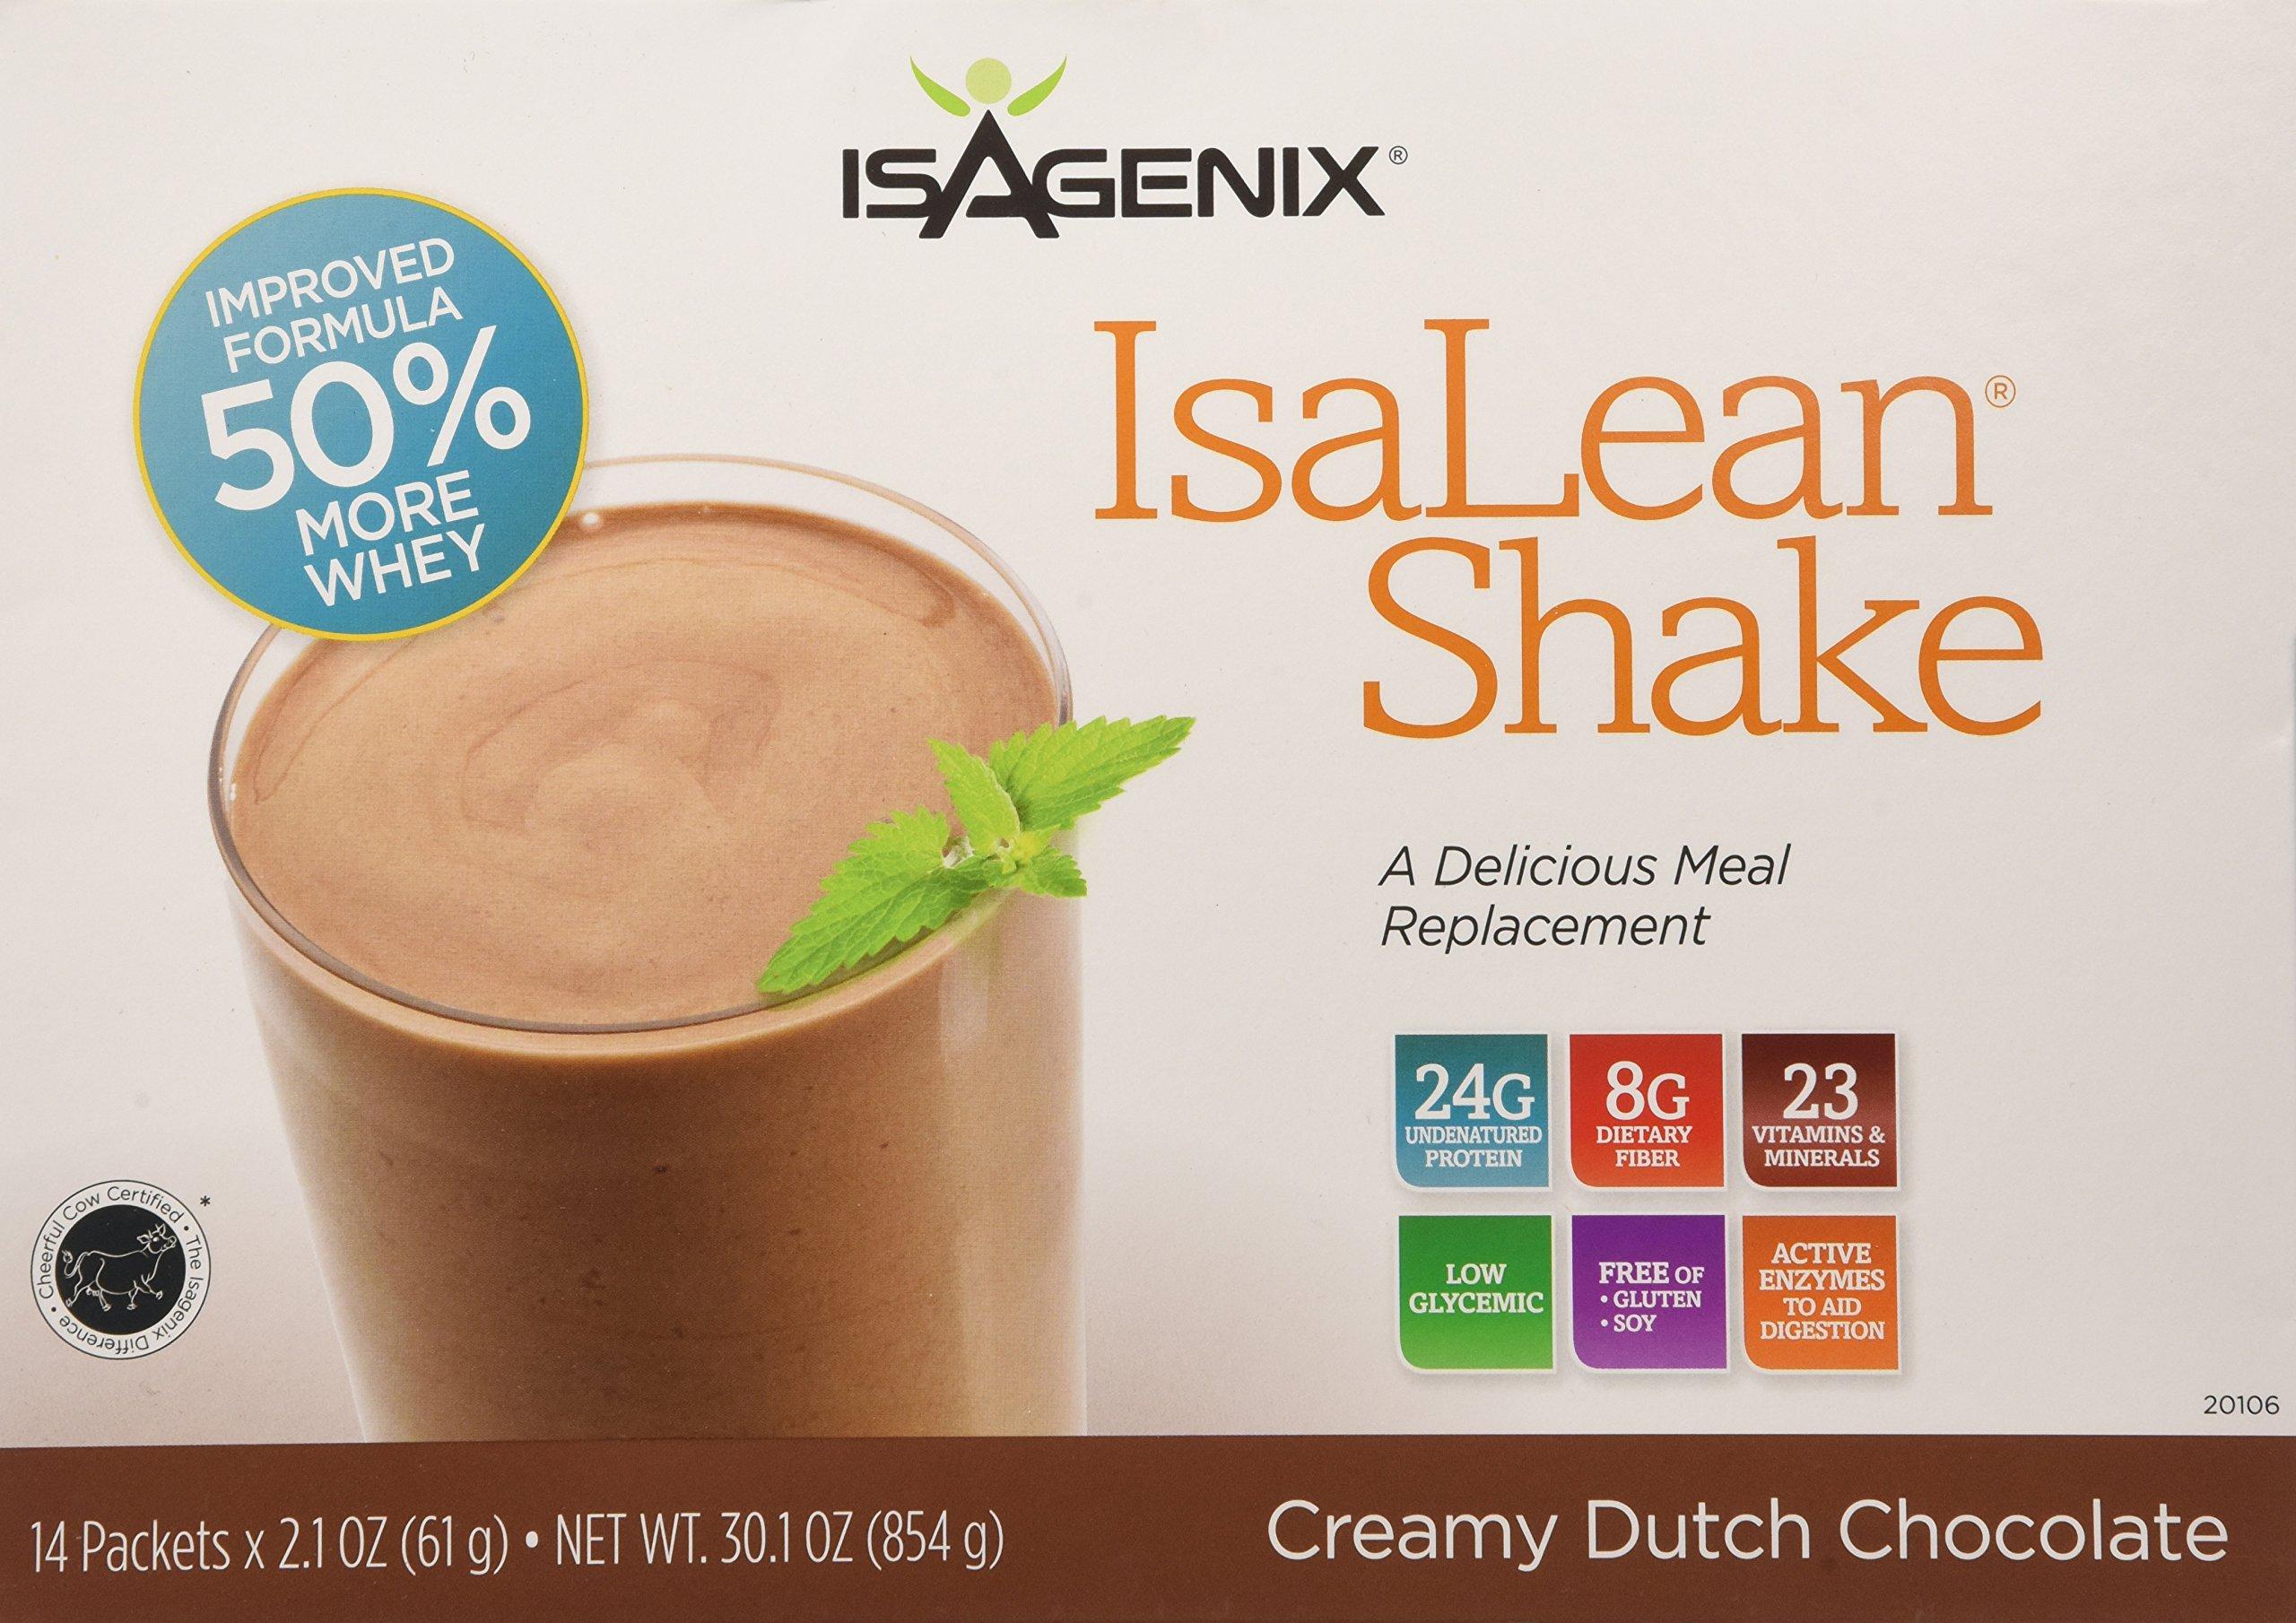 Isagenix Isalean Shake Natural Creamy Dutch Chocolate - 14 X 1 Meal Packets X 2.2 oz, 30.1 oz total